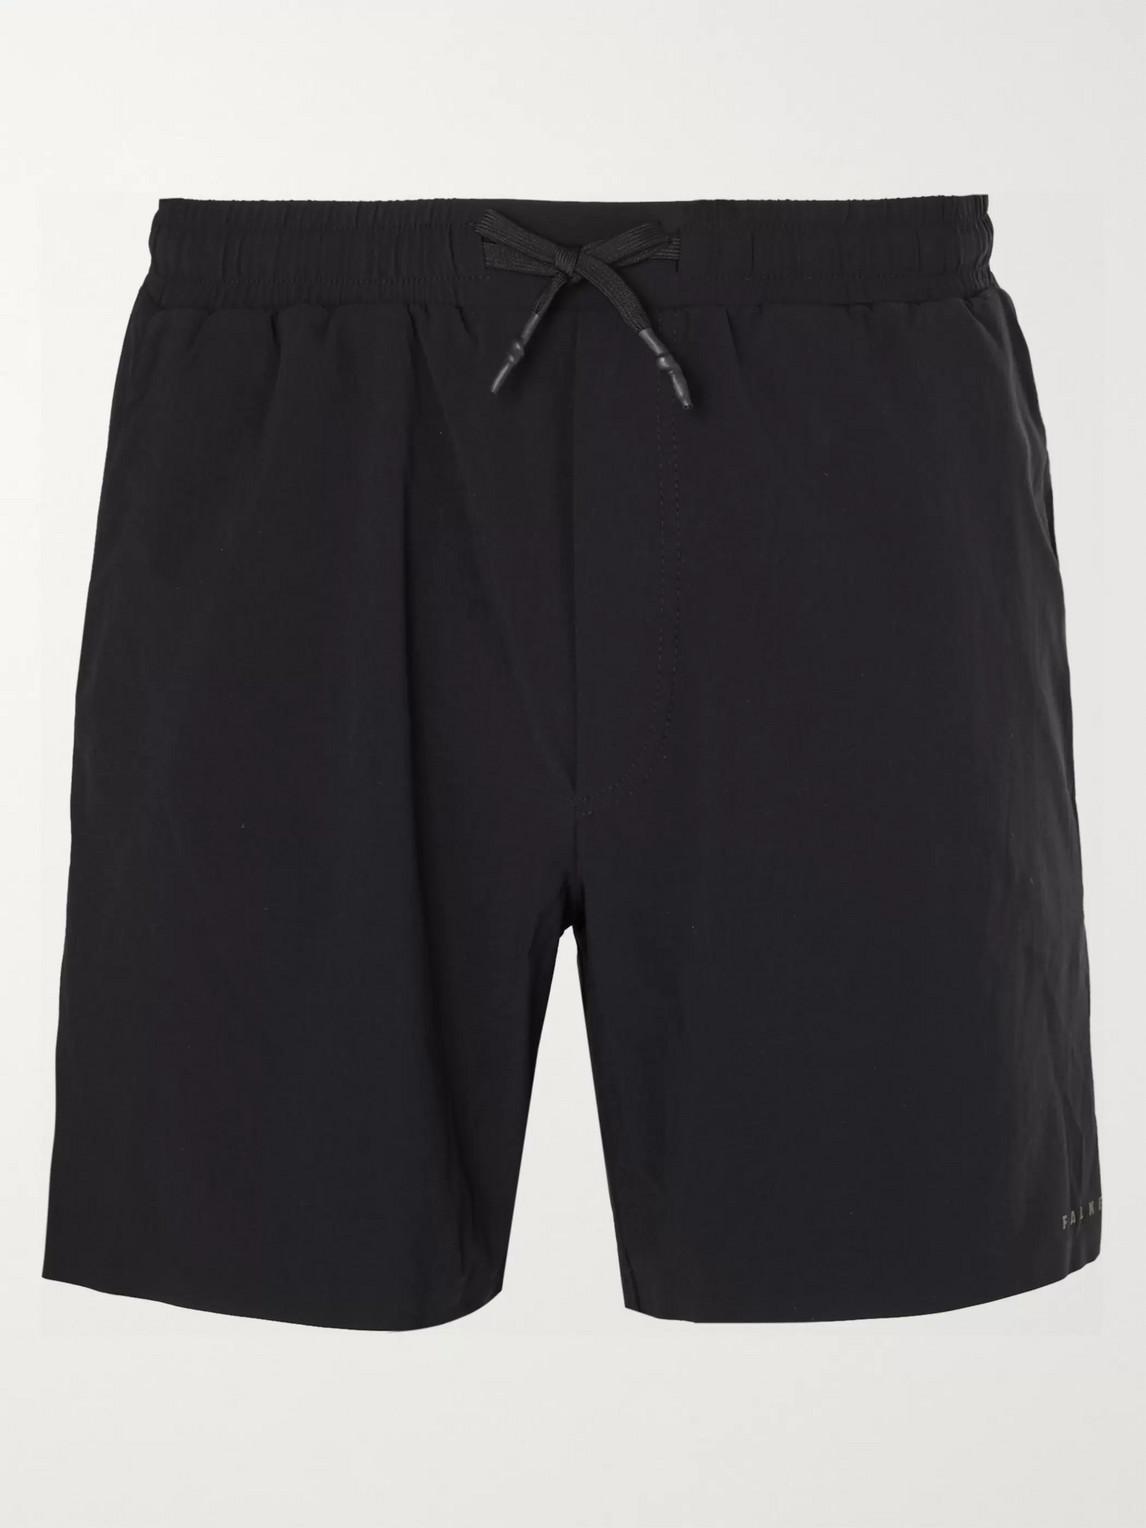 falke ergonomic sport system - basic challenger slim-fit stretch-shell shorts - men - black